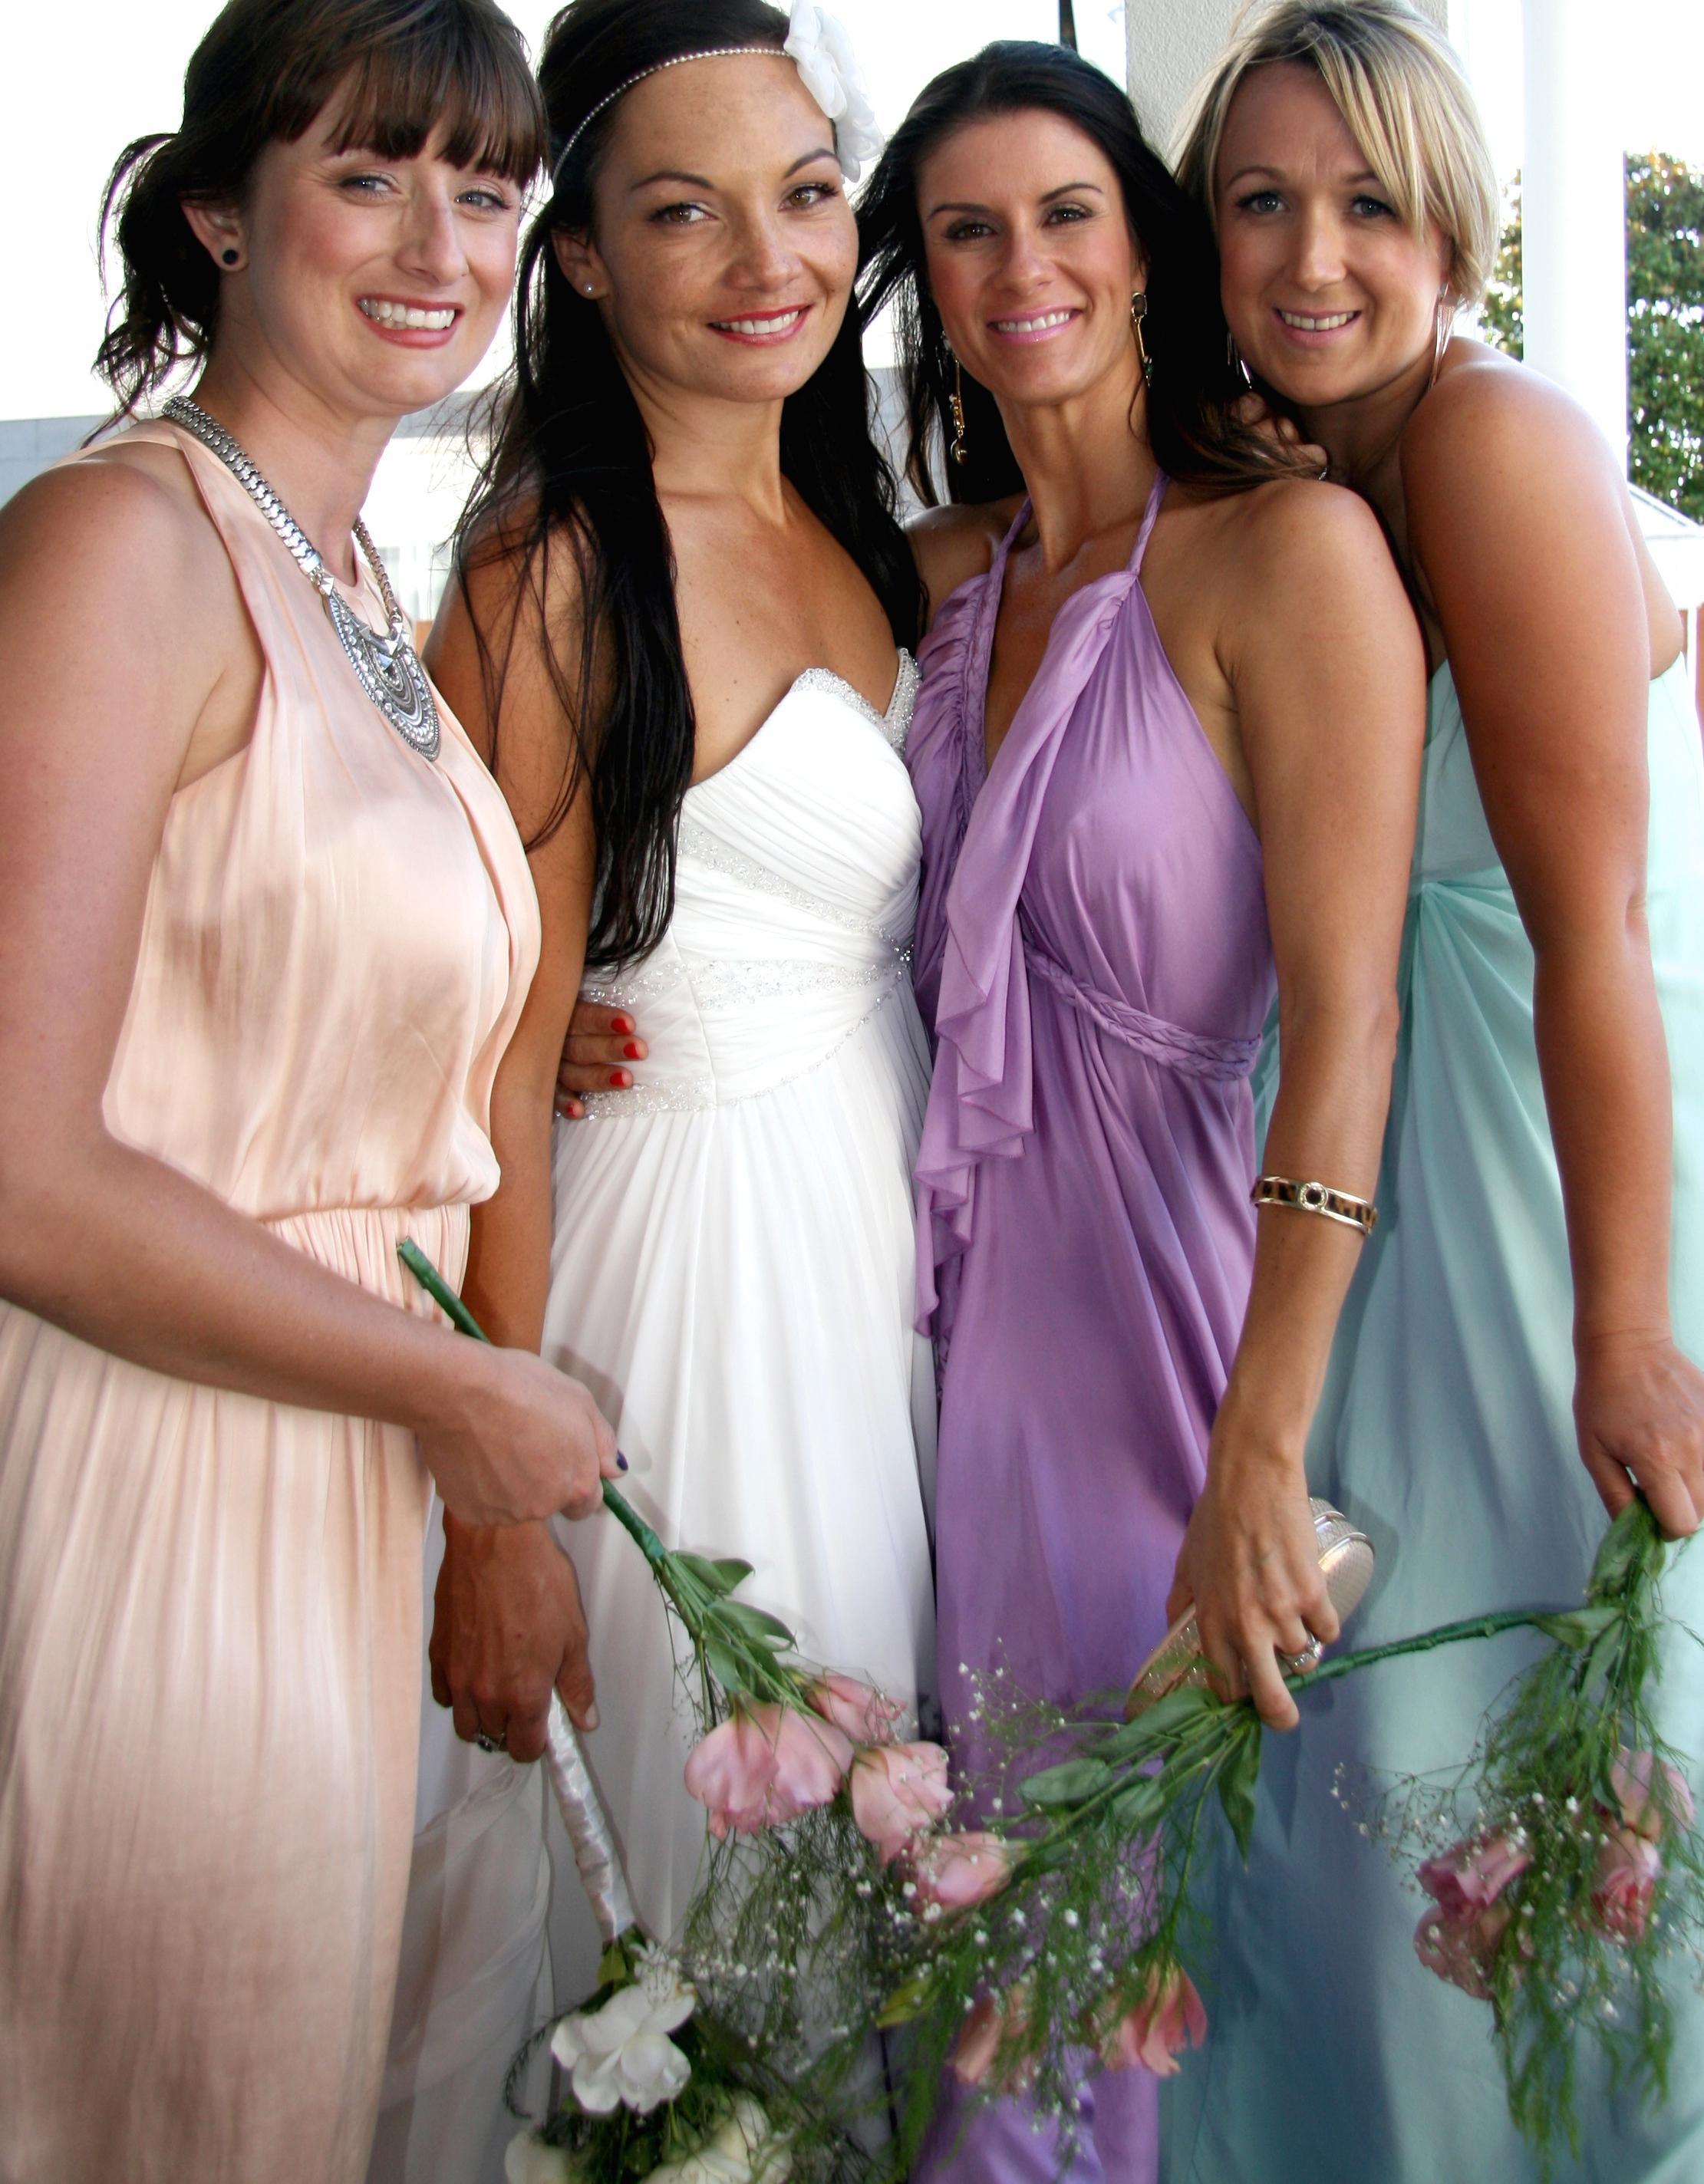 Professional wedding pics 049.jpg